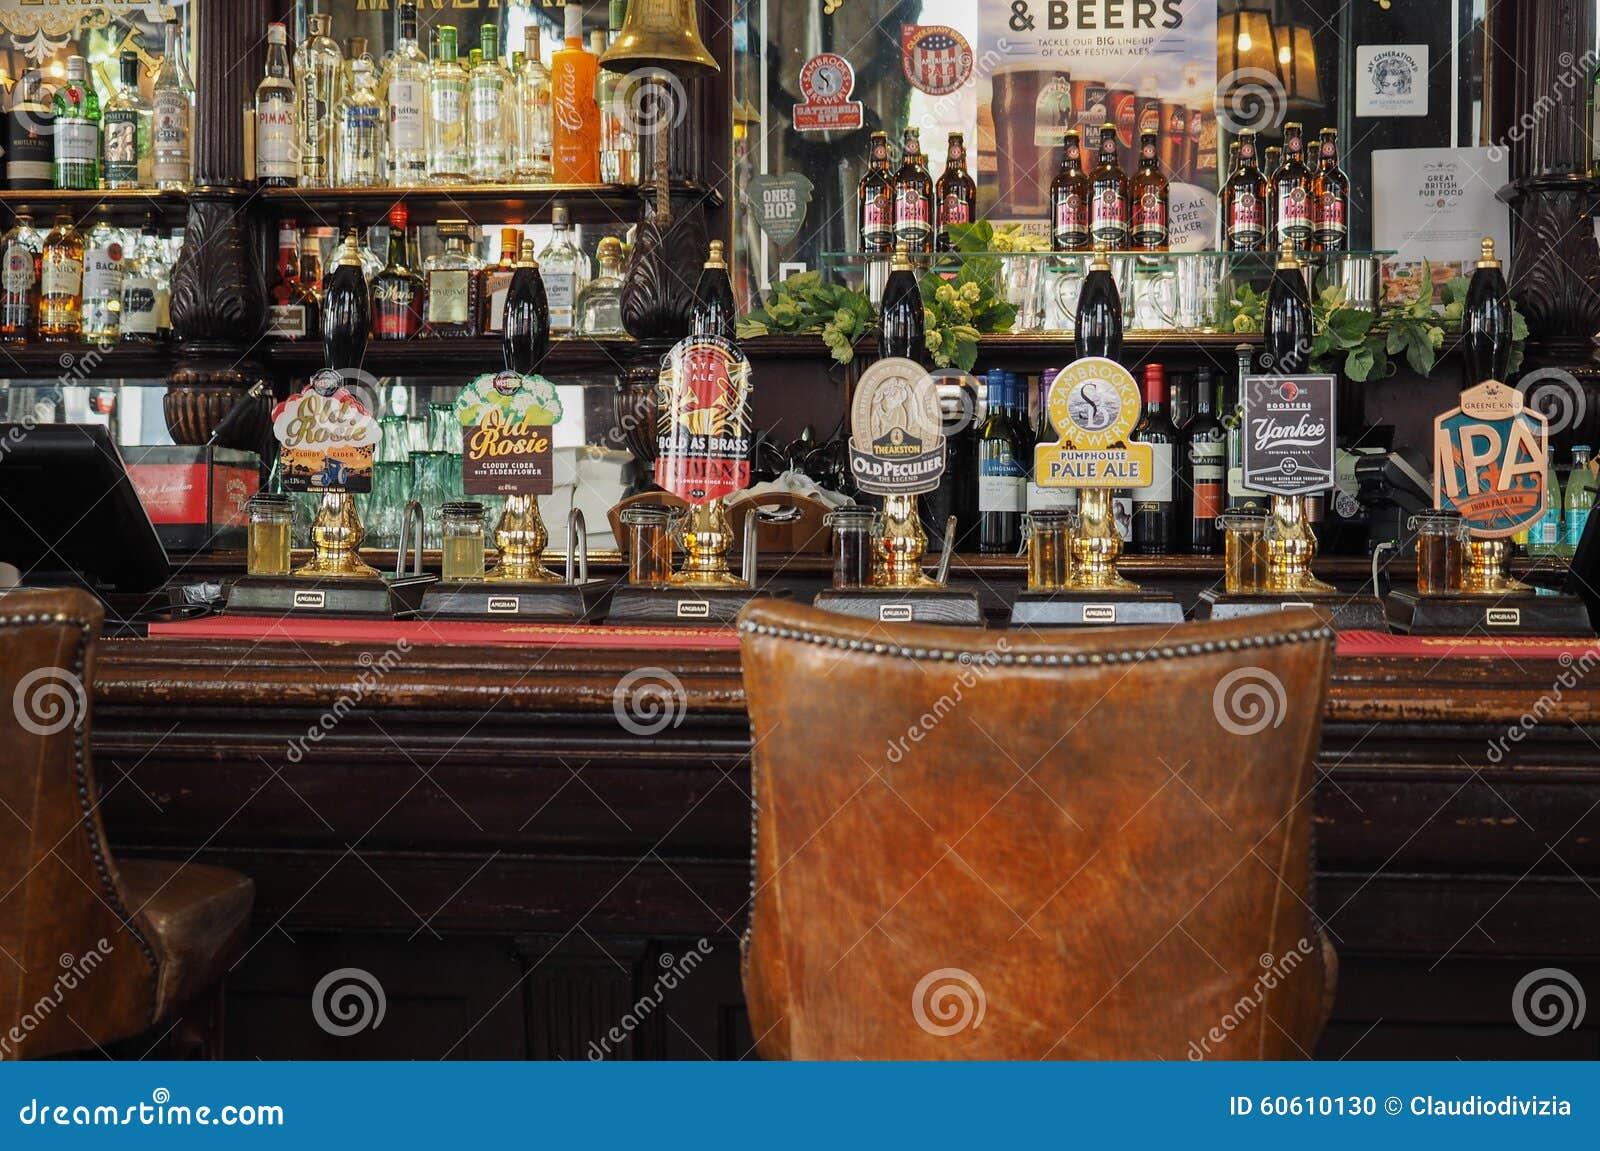 Cask beers in London